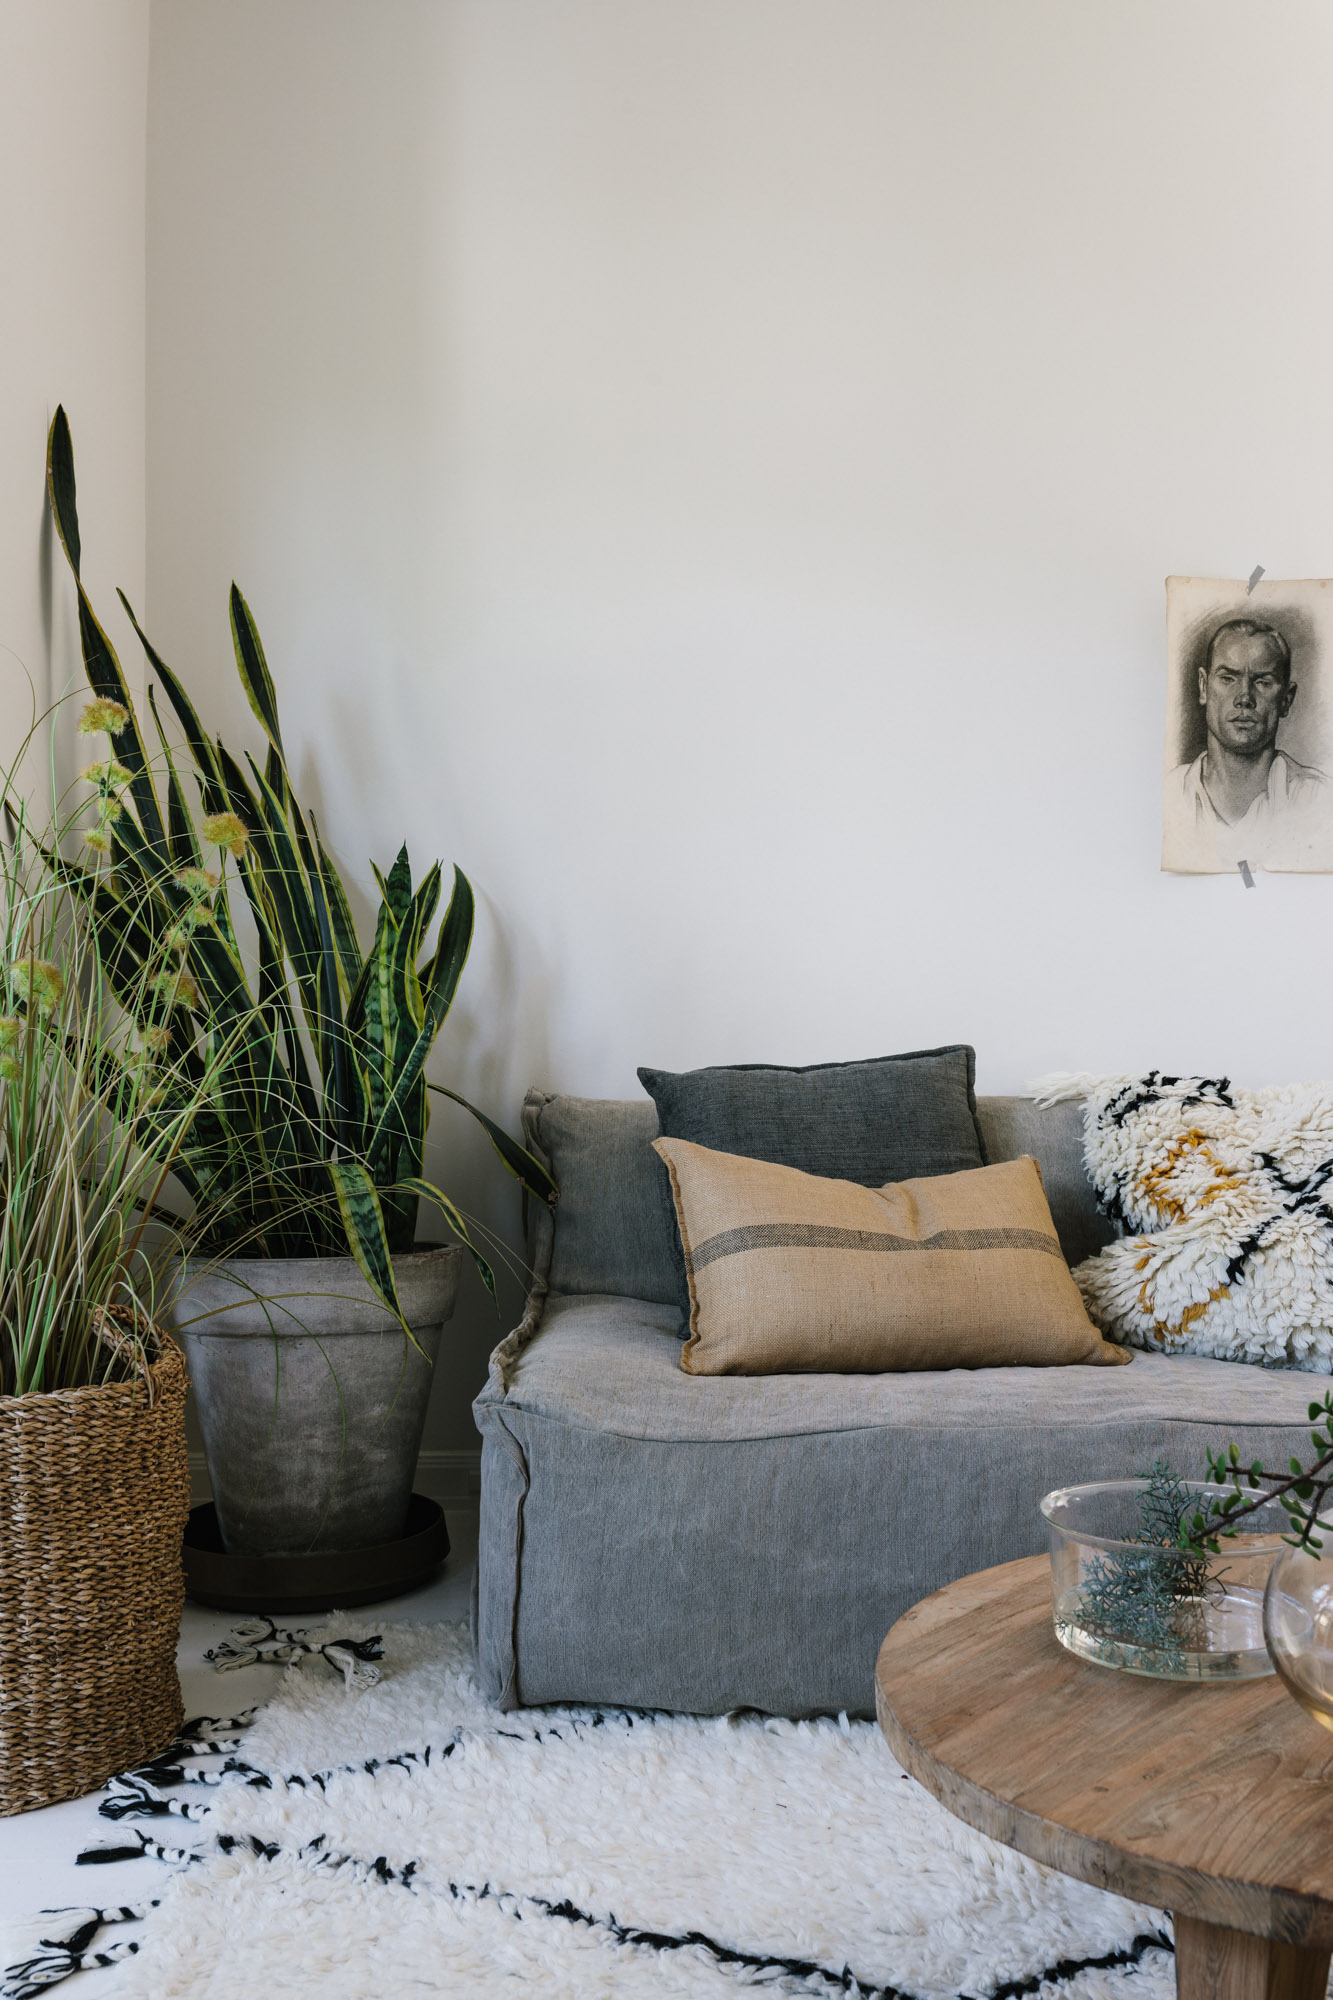 Lynda Gardener's The Studio, St Kilda. Styling by Inside Story and photography by Marnie Hawson